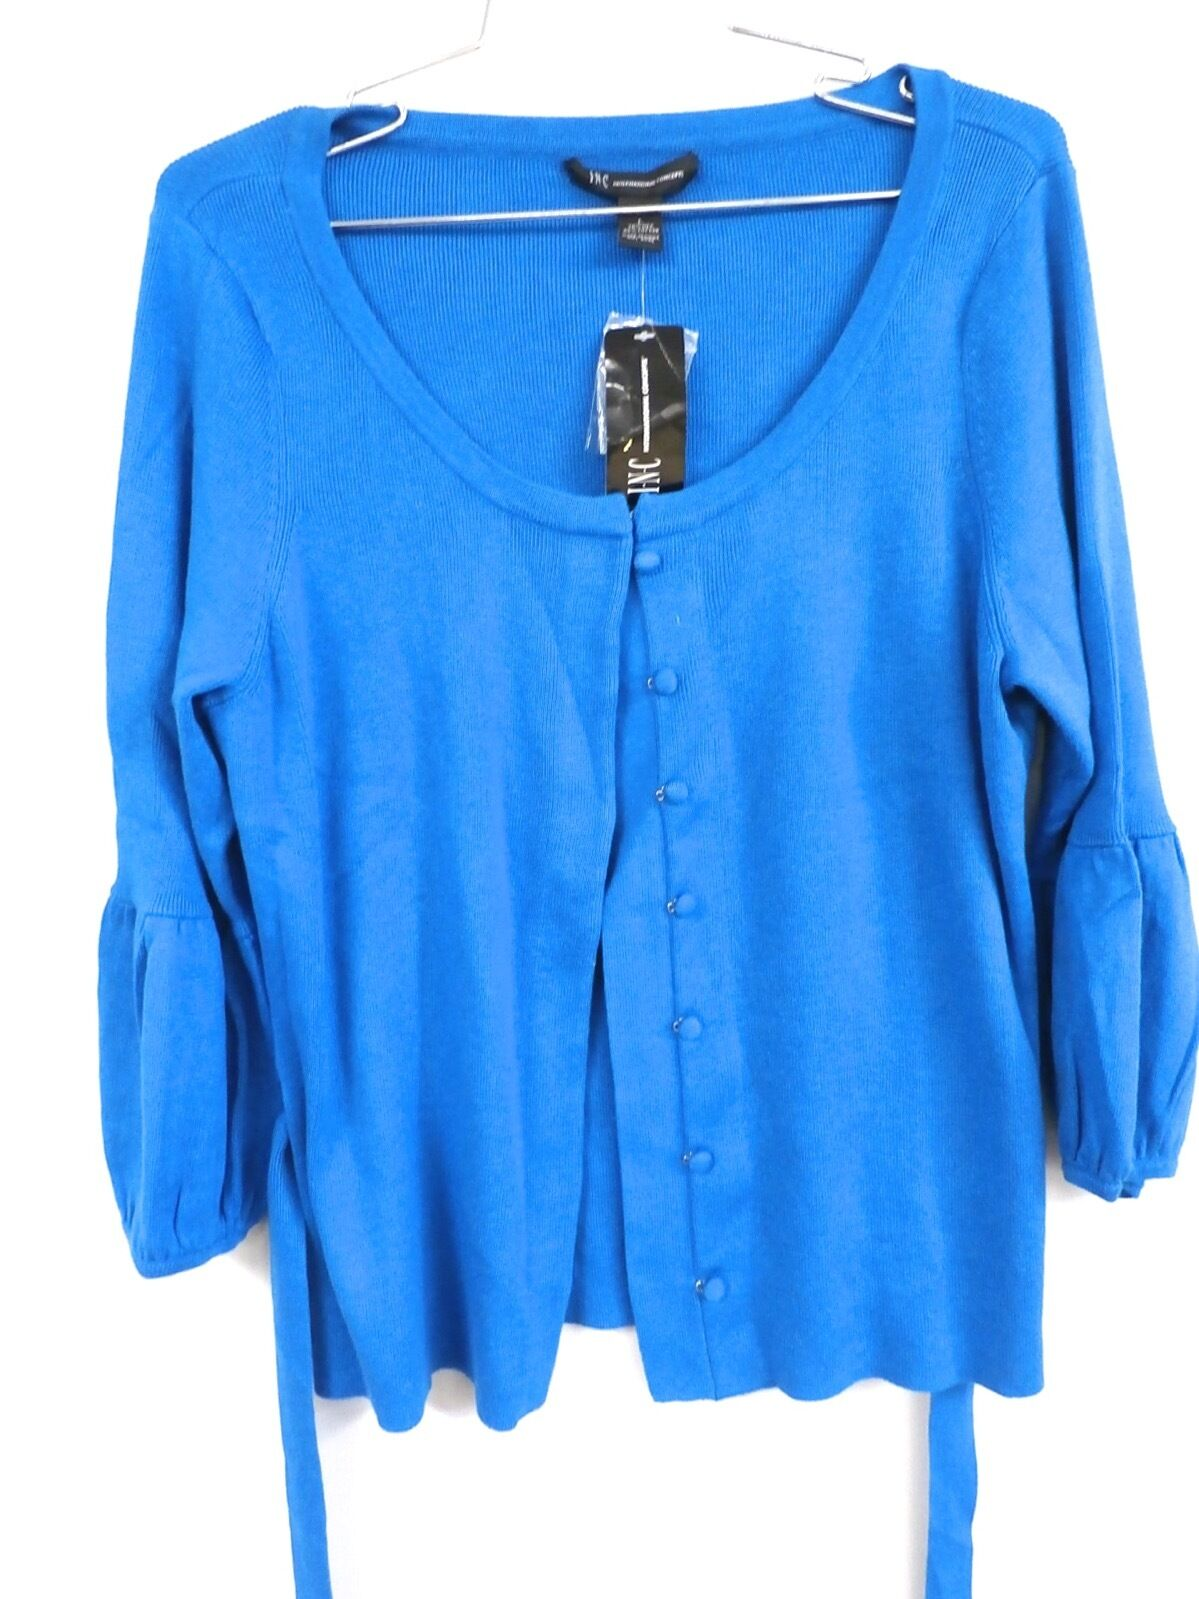 INC International Concepts Cardigan Sweater Belt Polished 1 Lunar bluee NWT  L